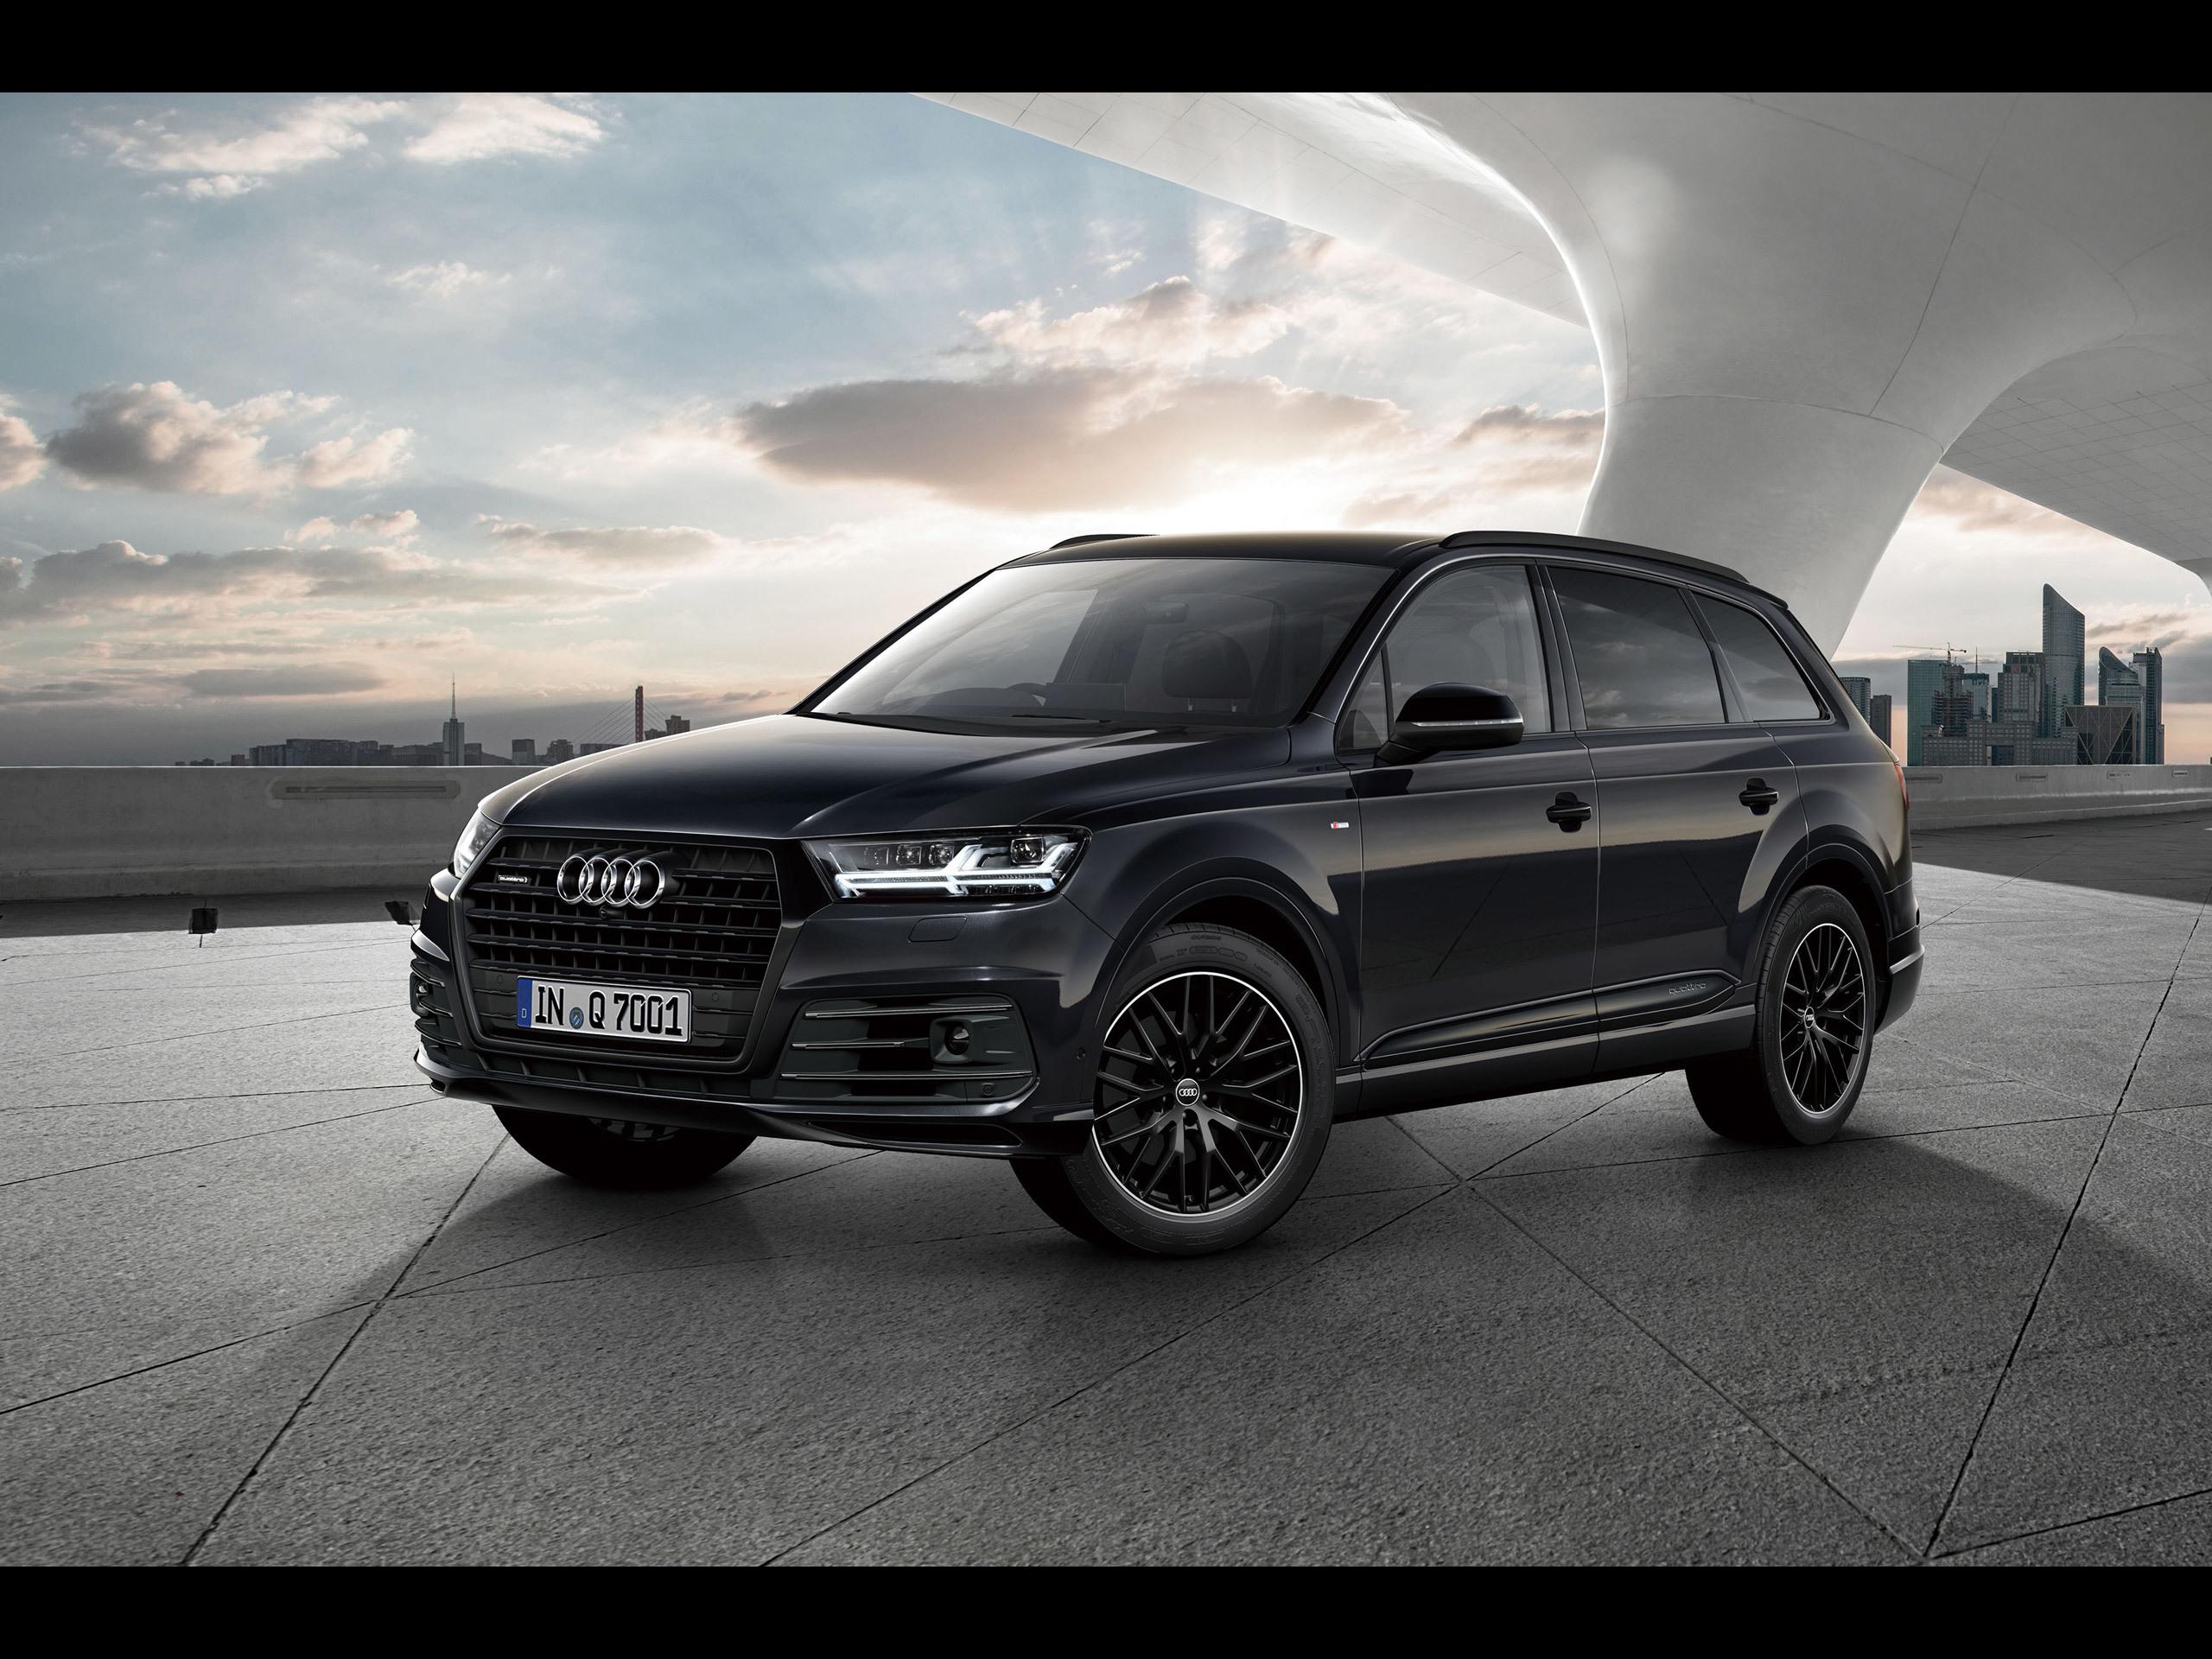 Audi Q7 Black Styling 2019 アウディに嵌まる 壁紙画像ブログ